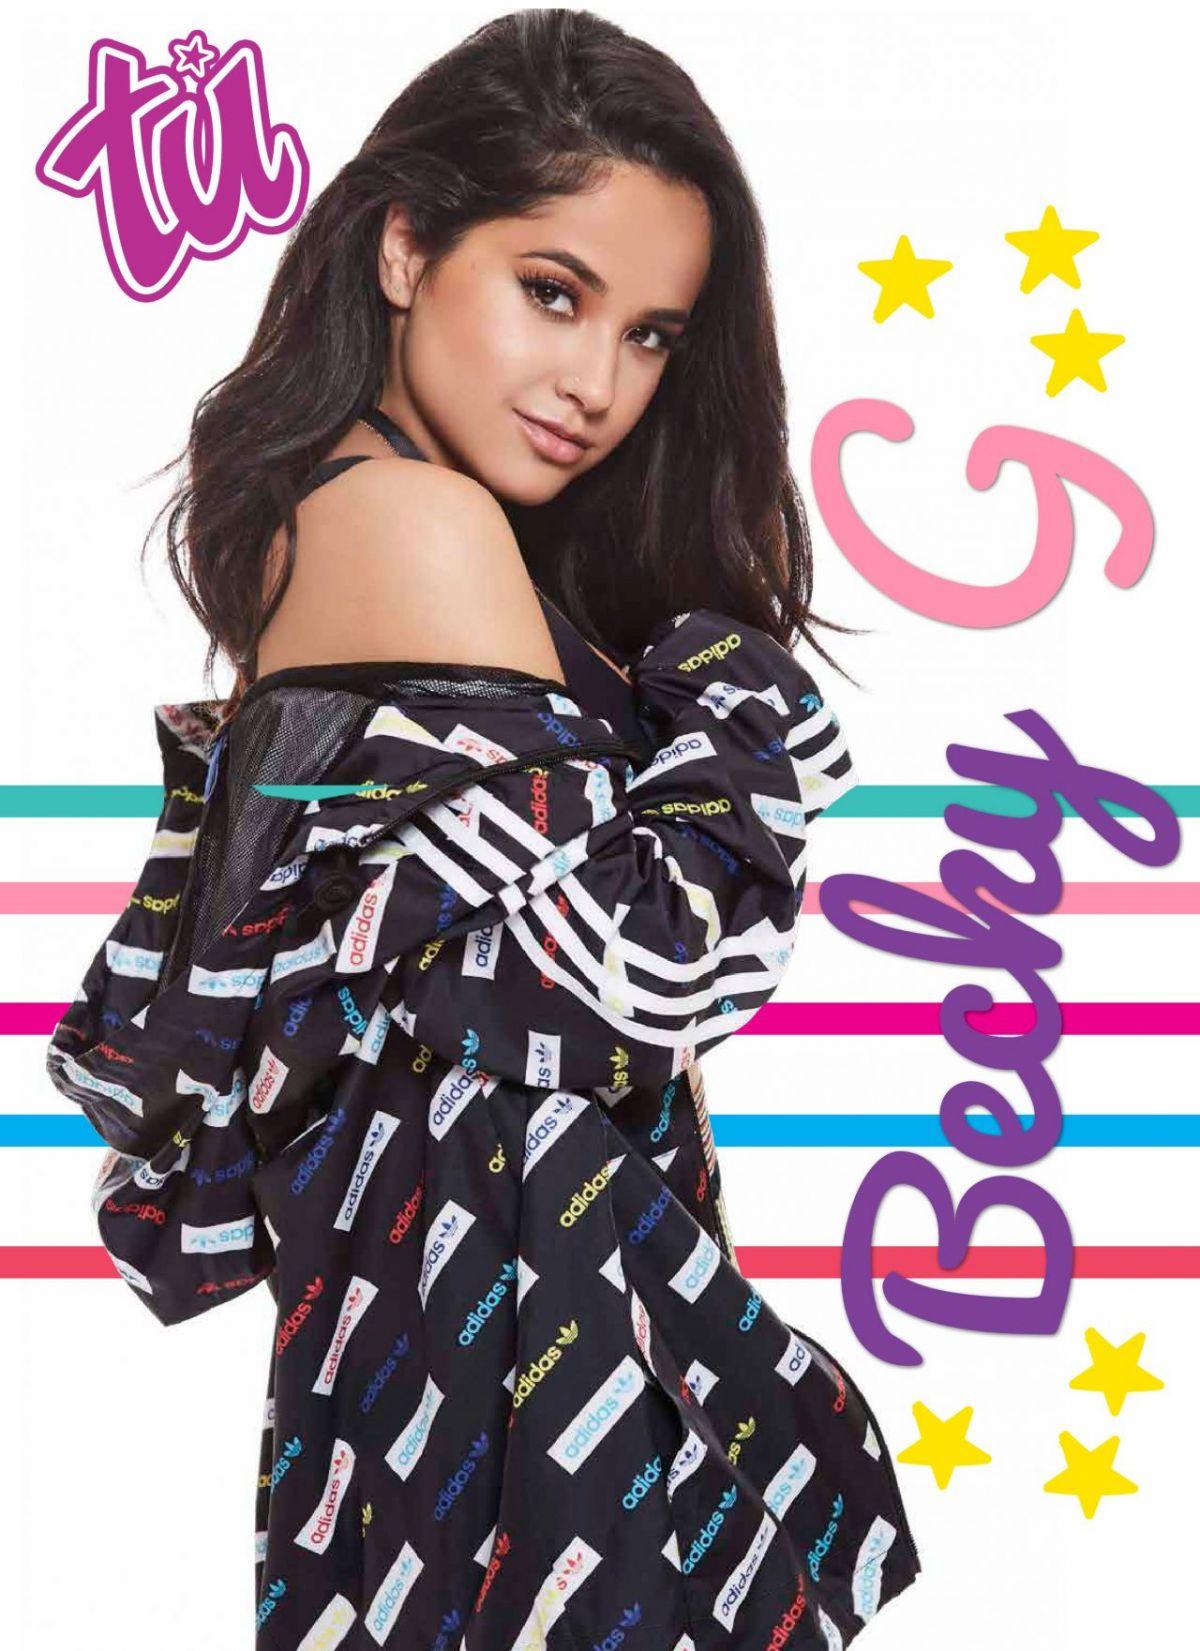 BECKY G in TU Magazine, March 2017